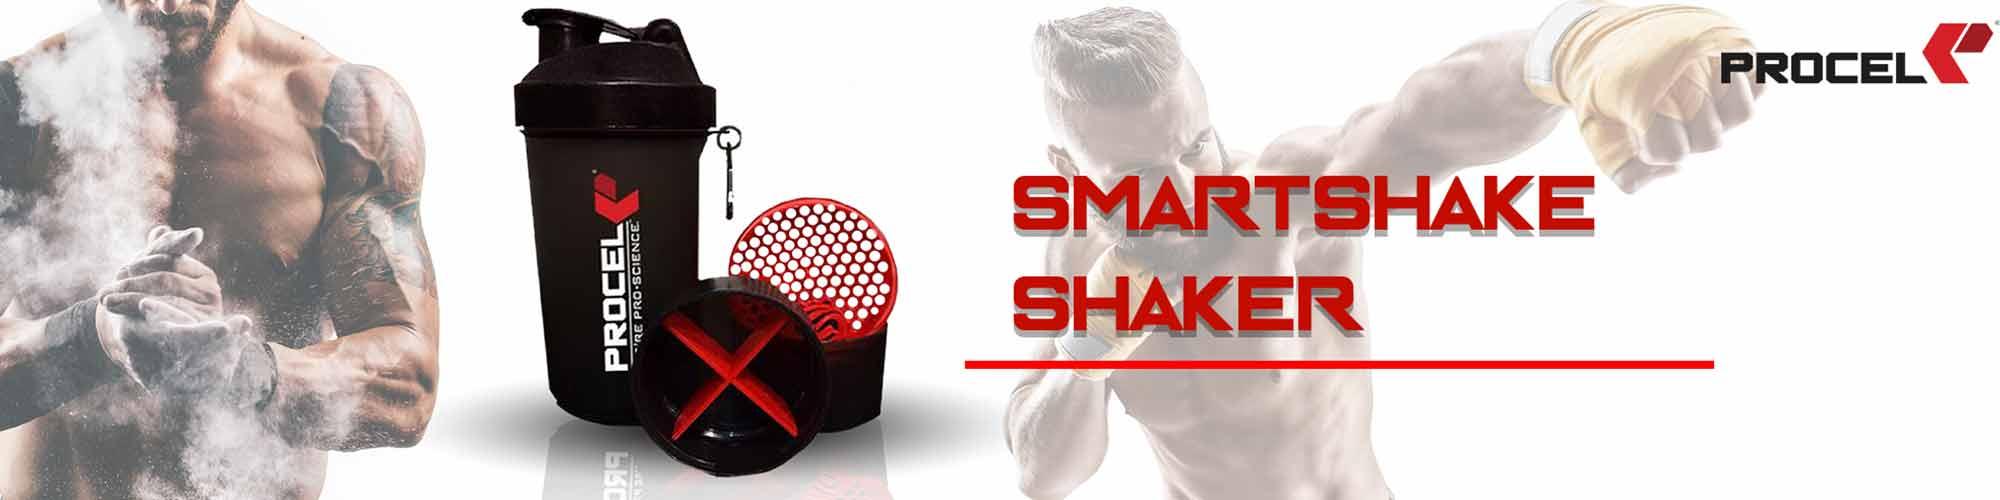 smartshake-shaker-banner